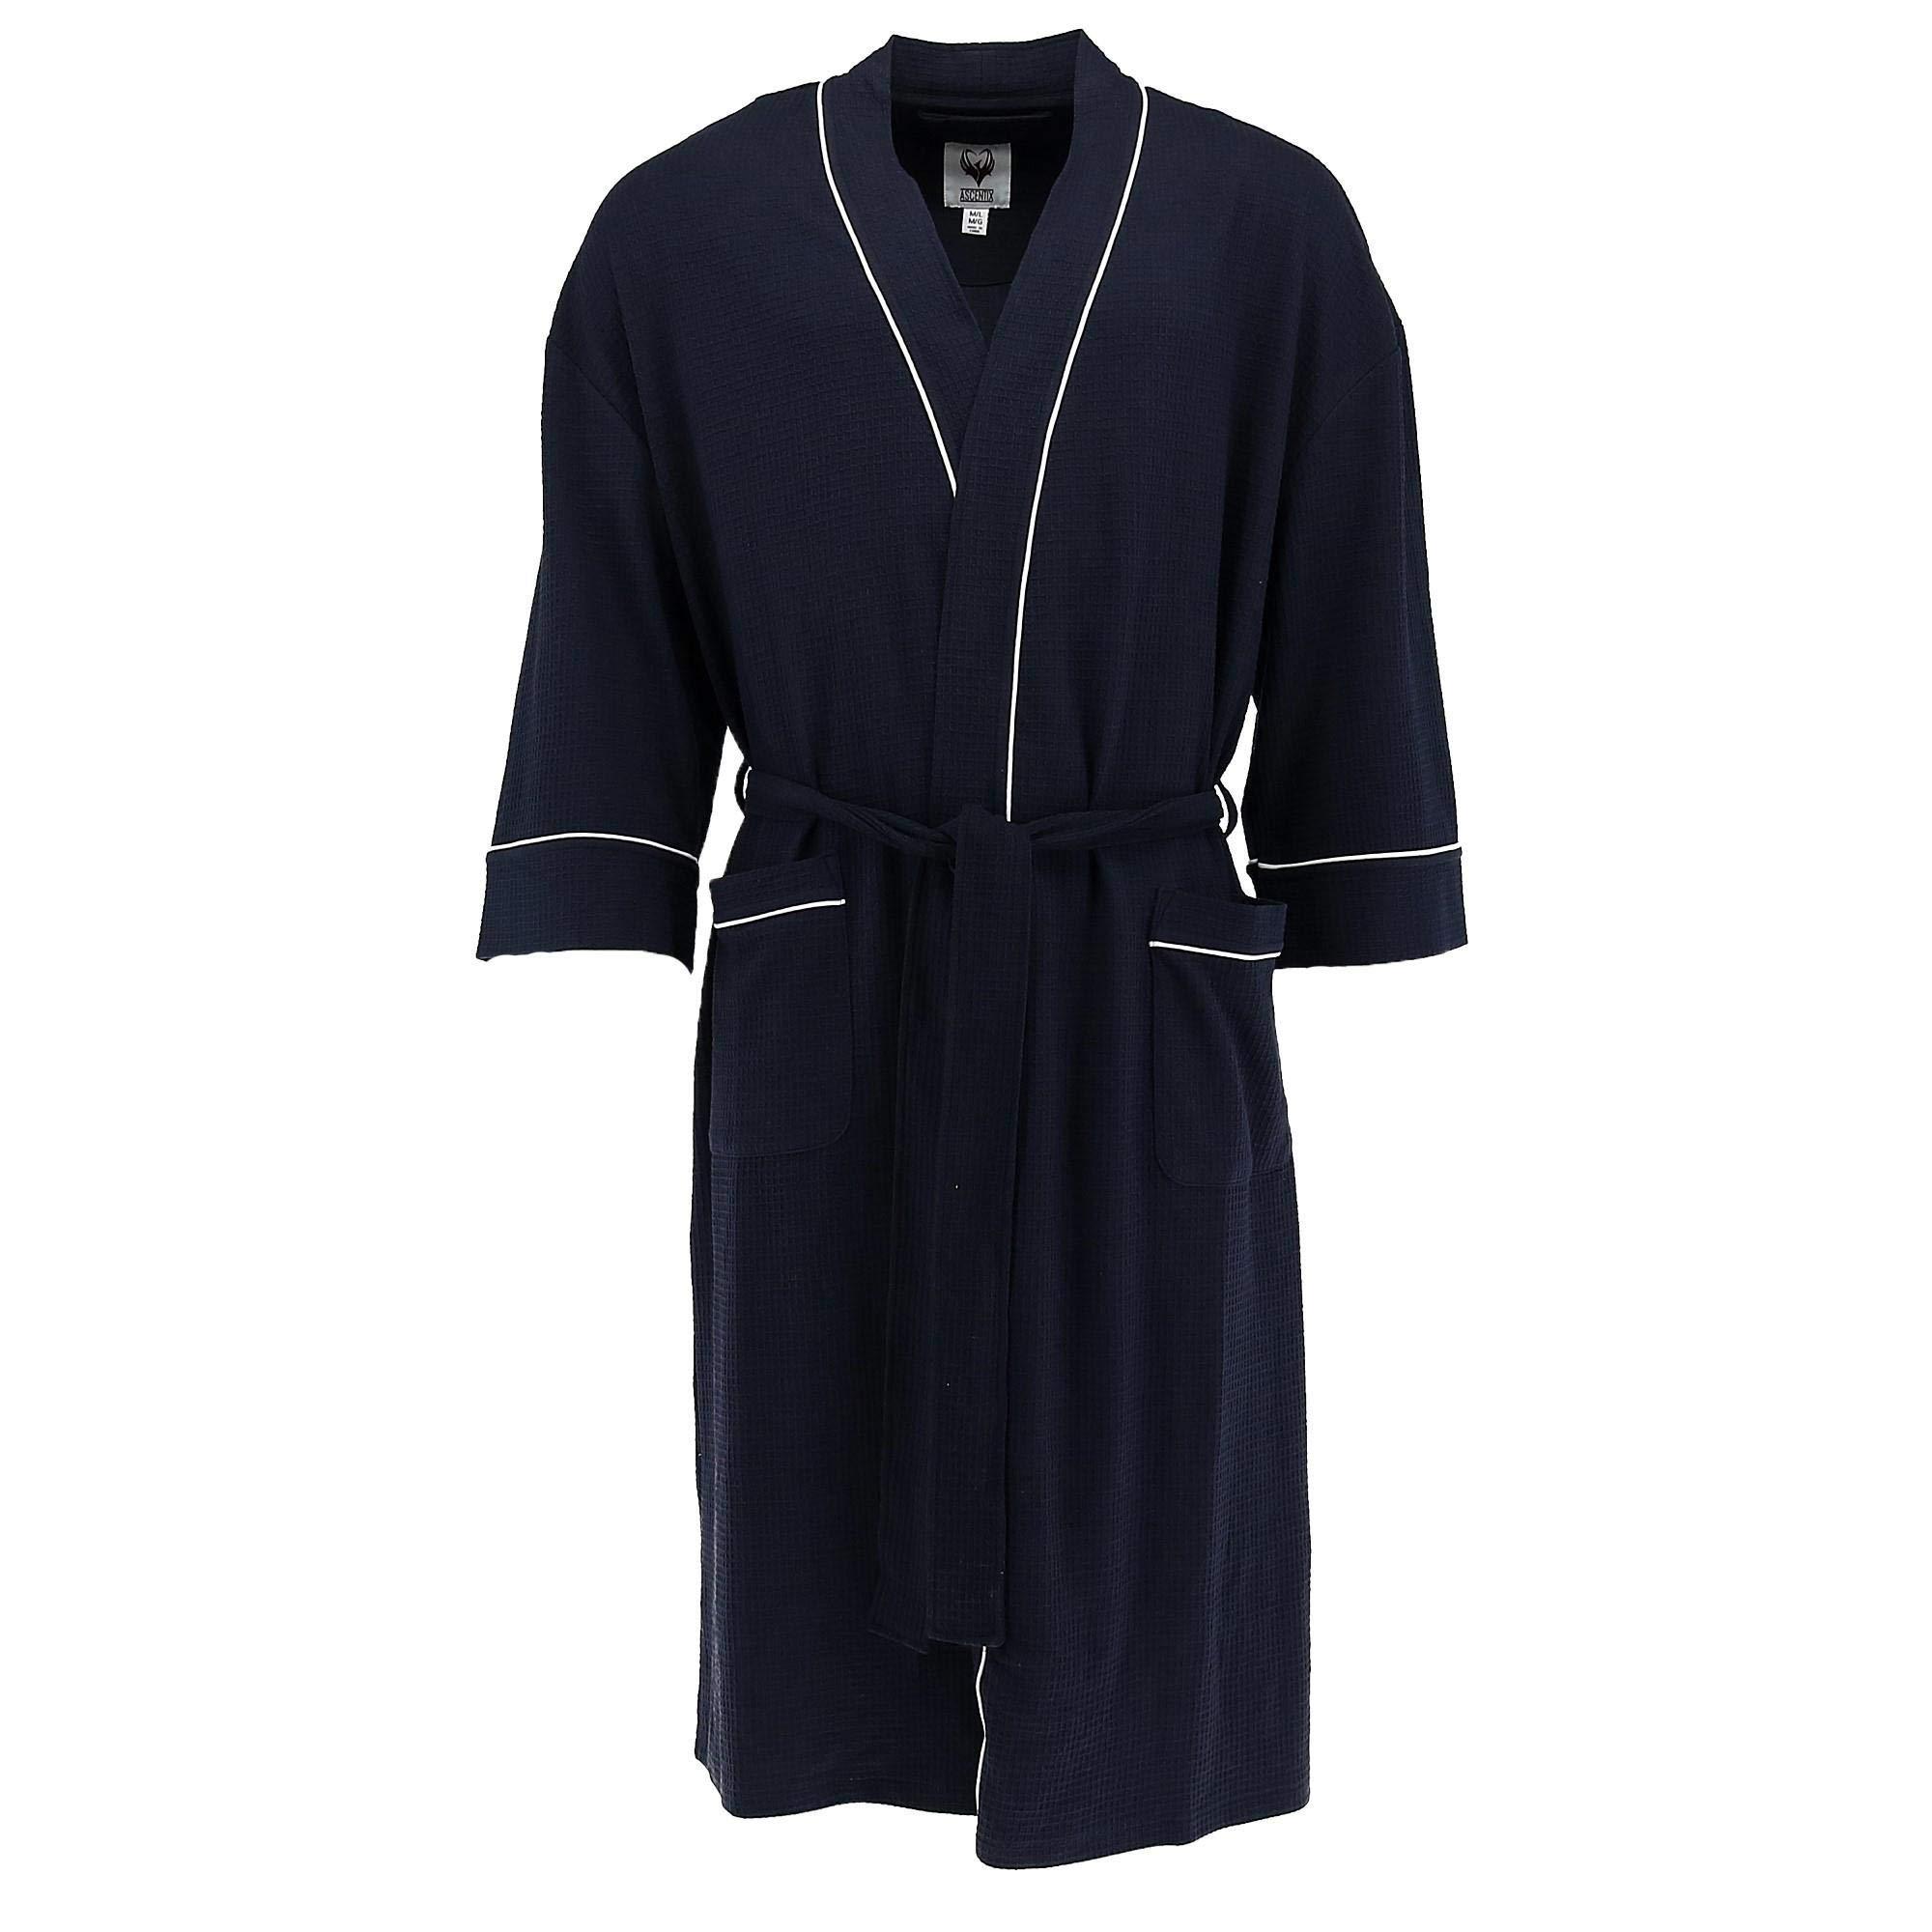 Ascentix Men's Big and Tall Waffle Knit Robe, LT/XLT, Navy